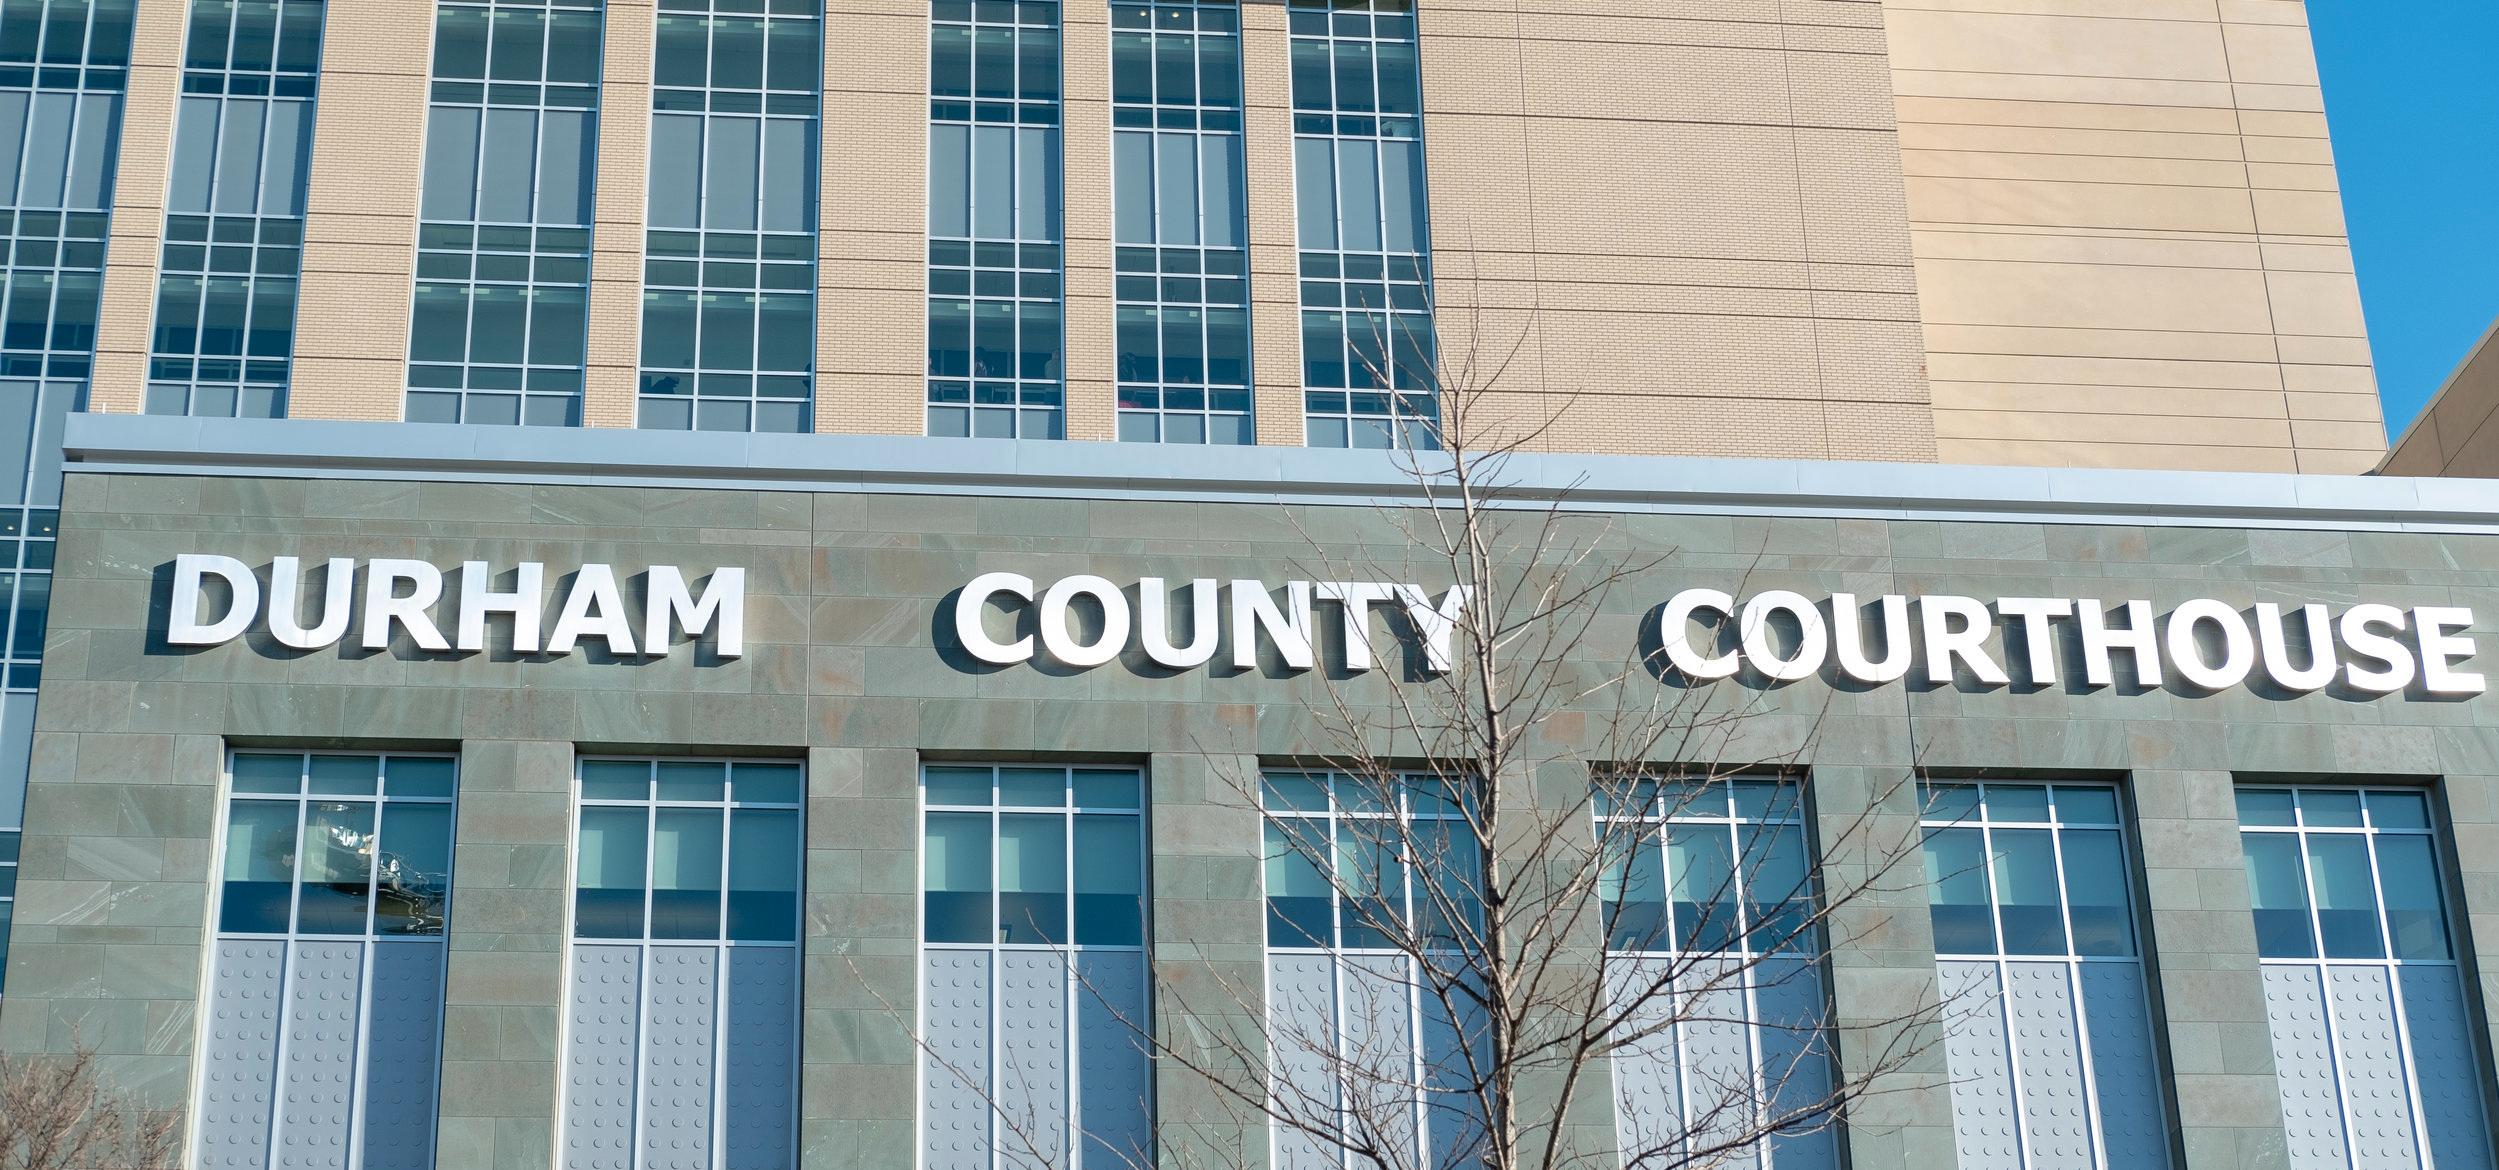 Durham County Courthouse. 2018. Photo credit: Karla Jimenez-Magdaleno